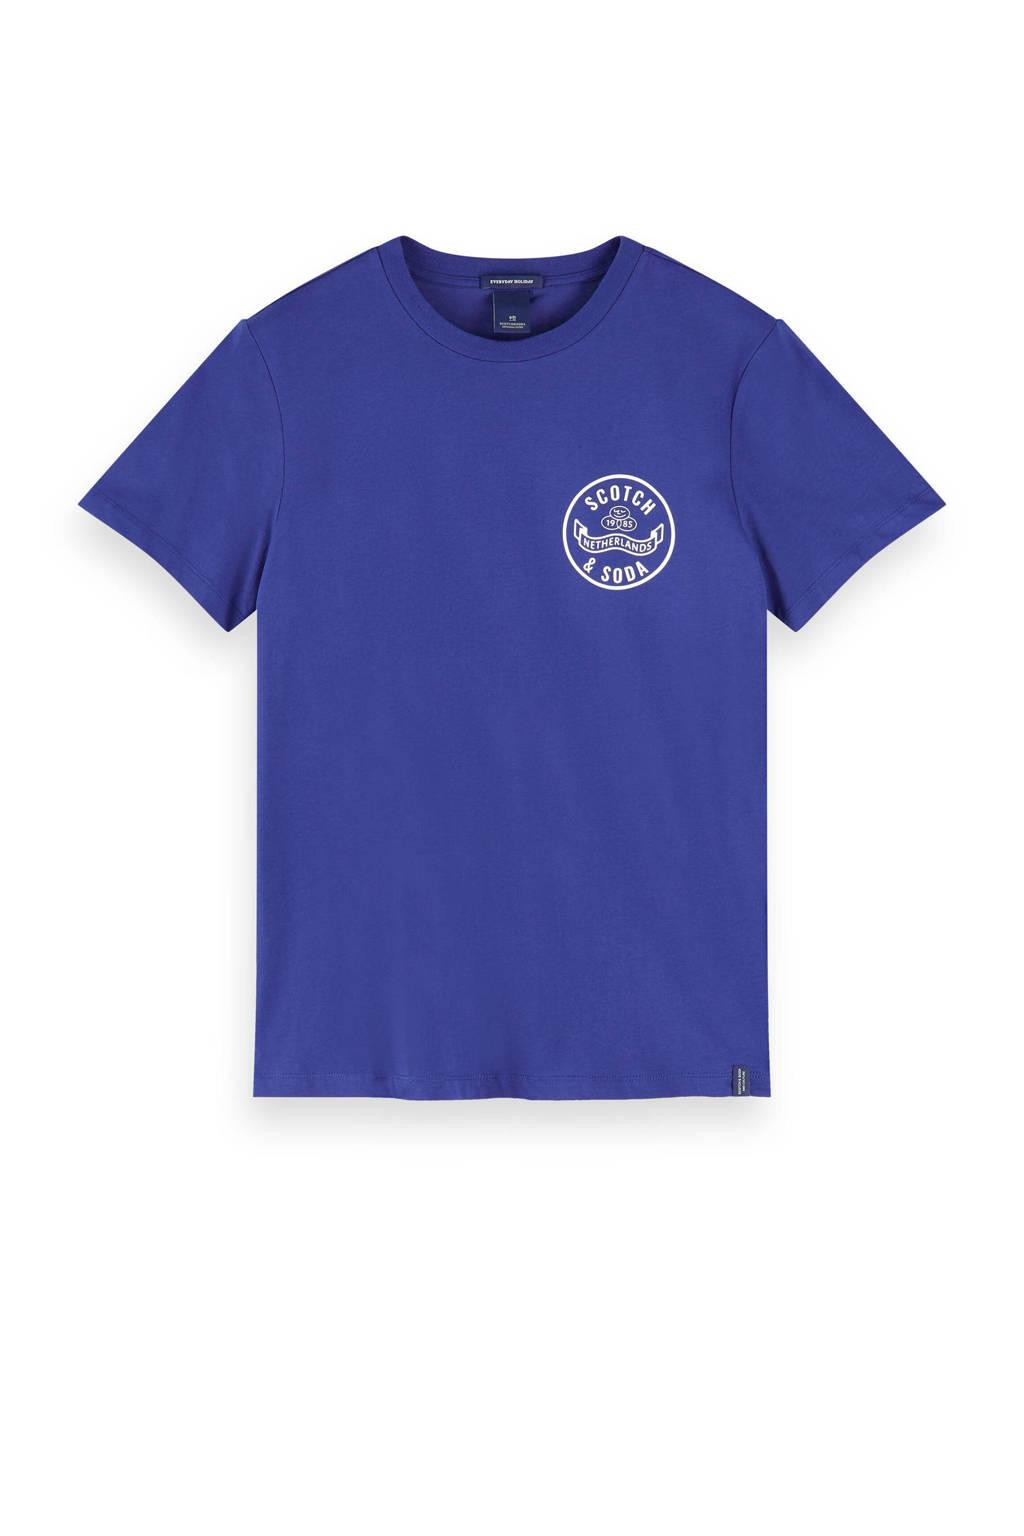 Scotch & Soda T-shirt met printopdruk blauw, Blauw